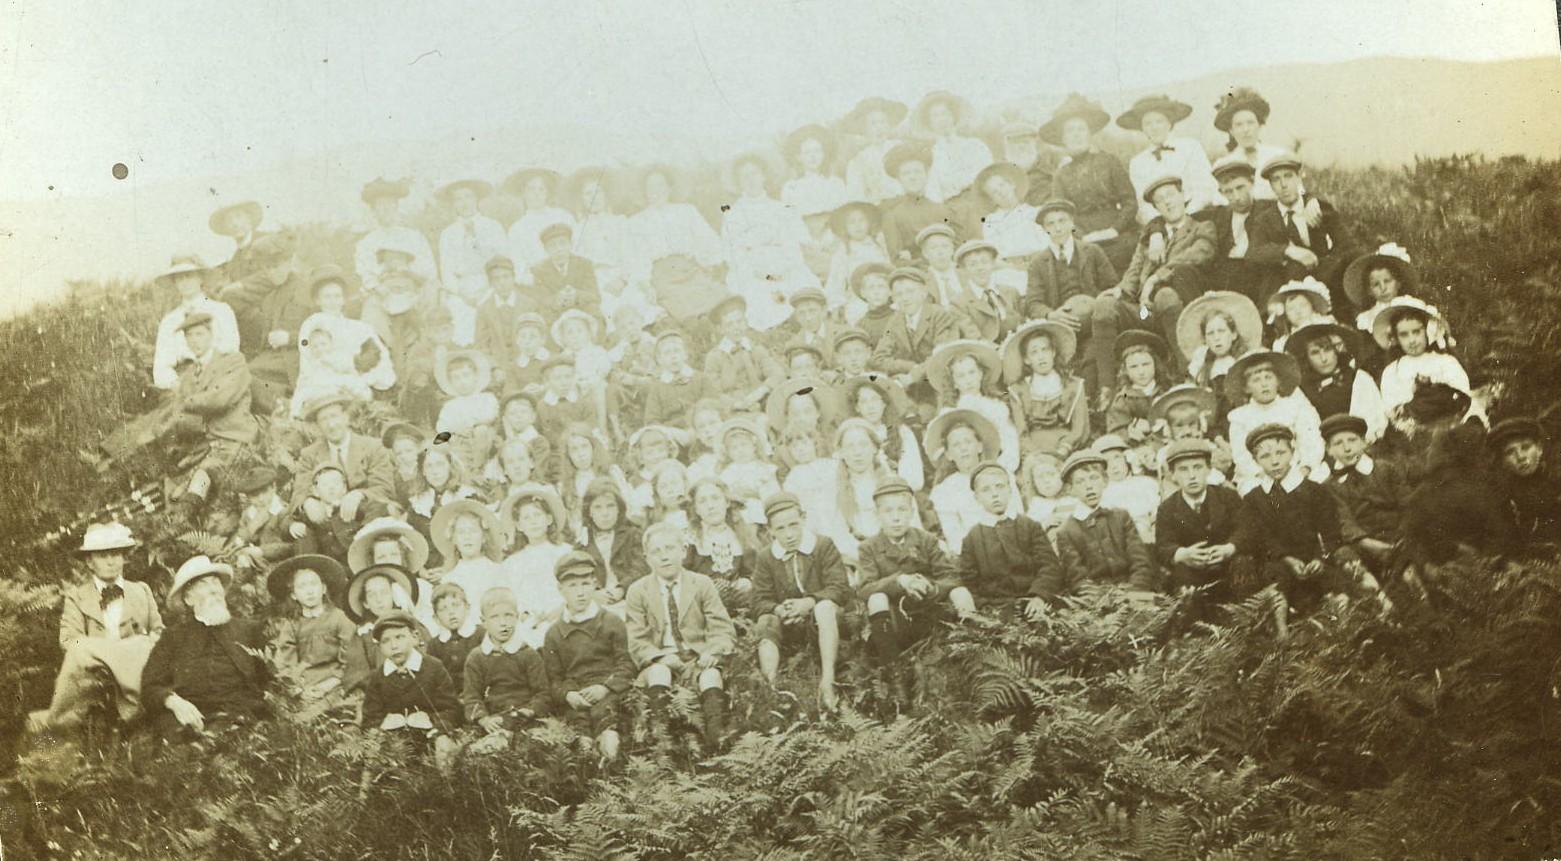 Group of People, Ardkinglas